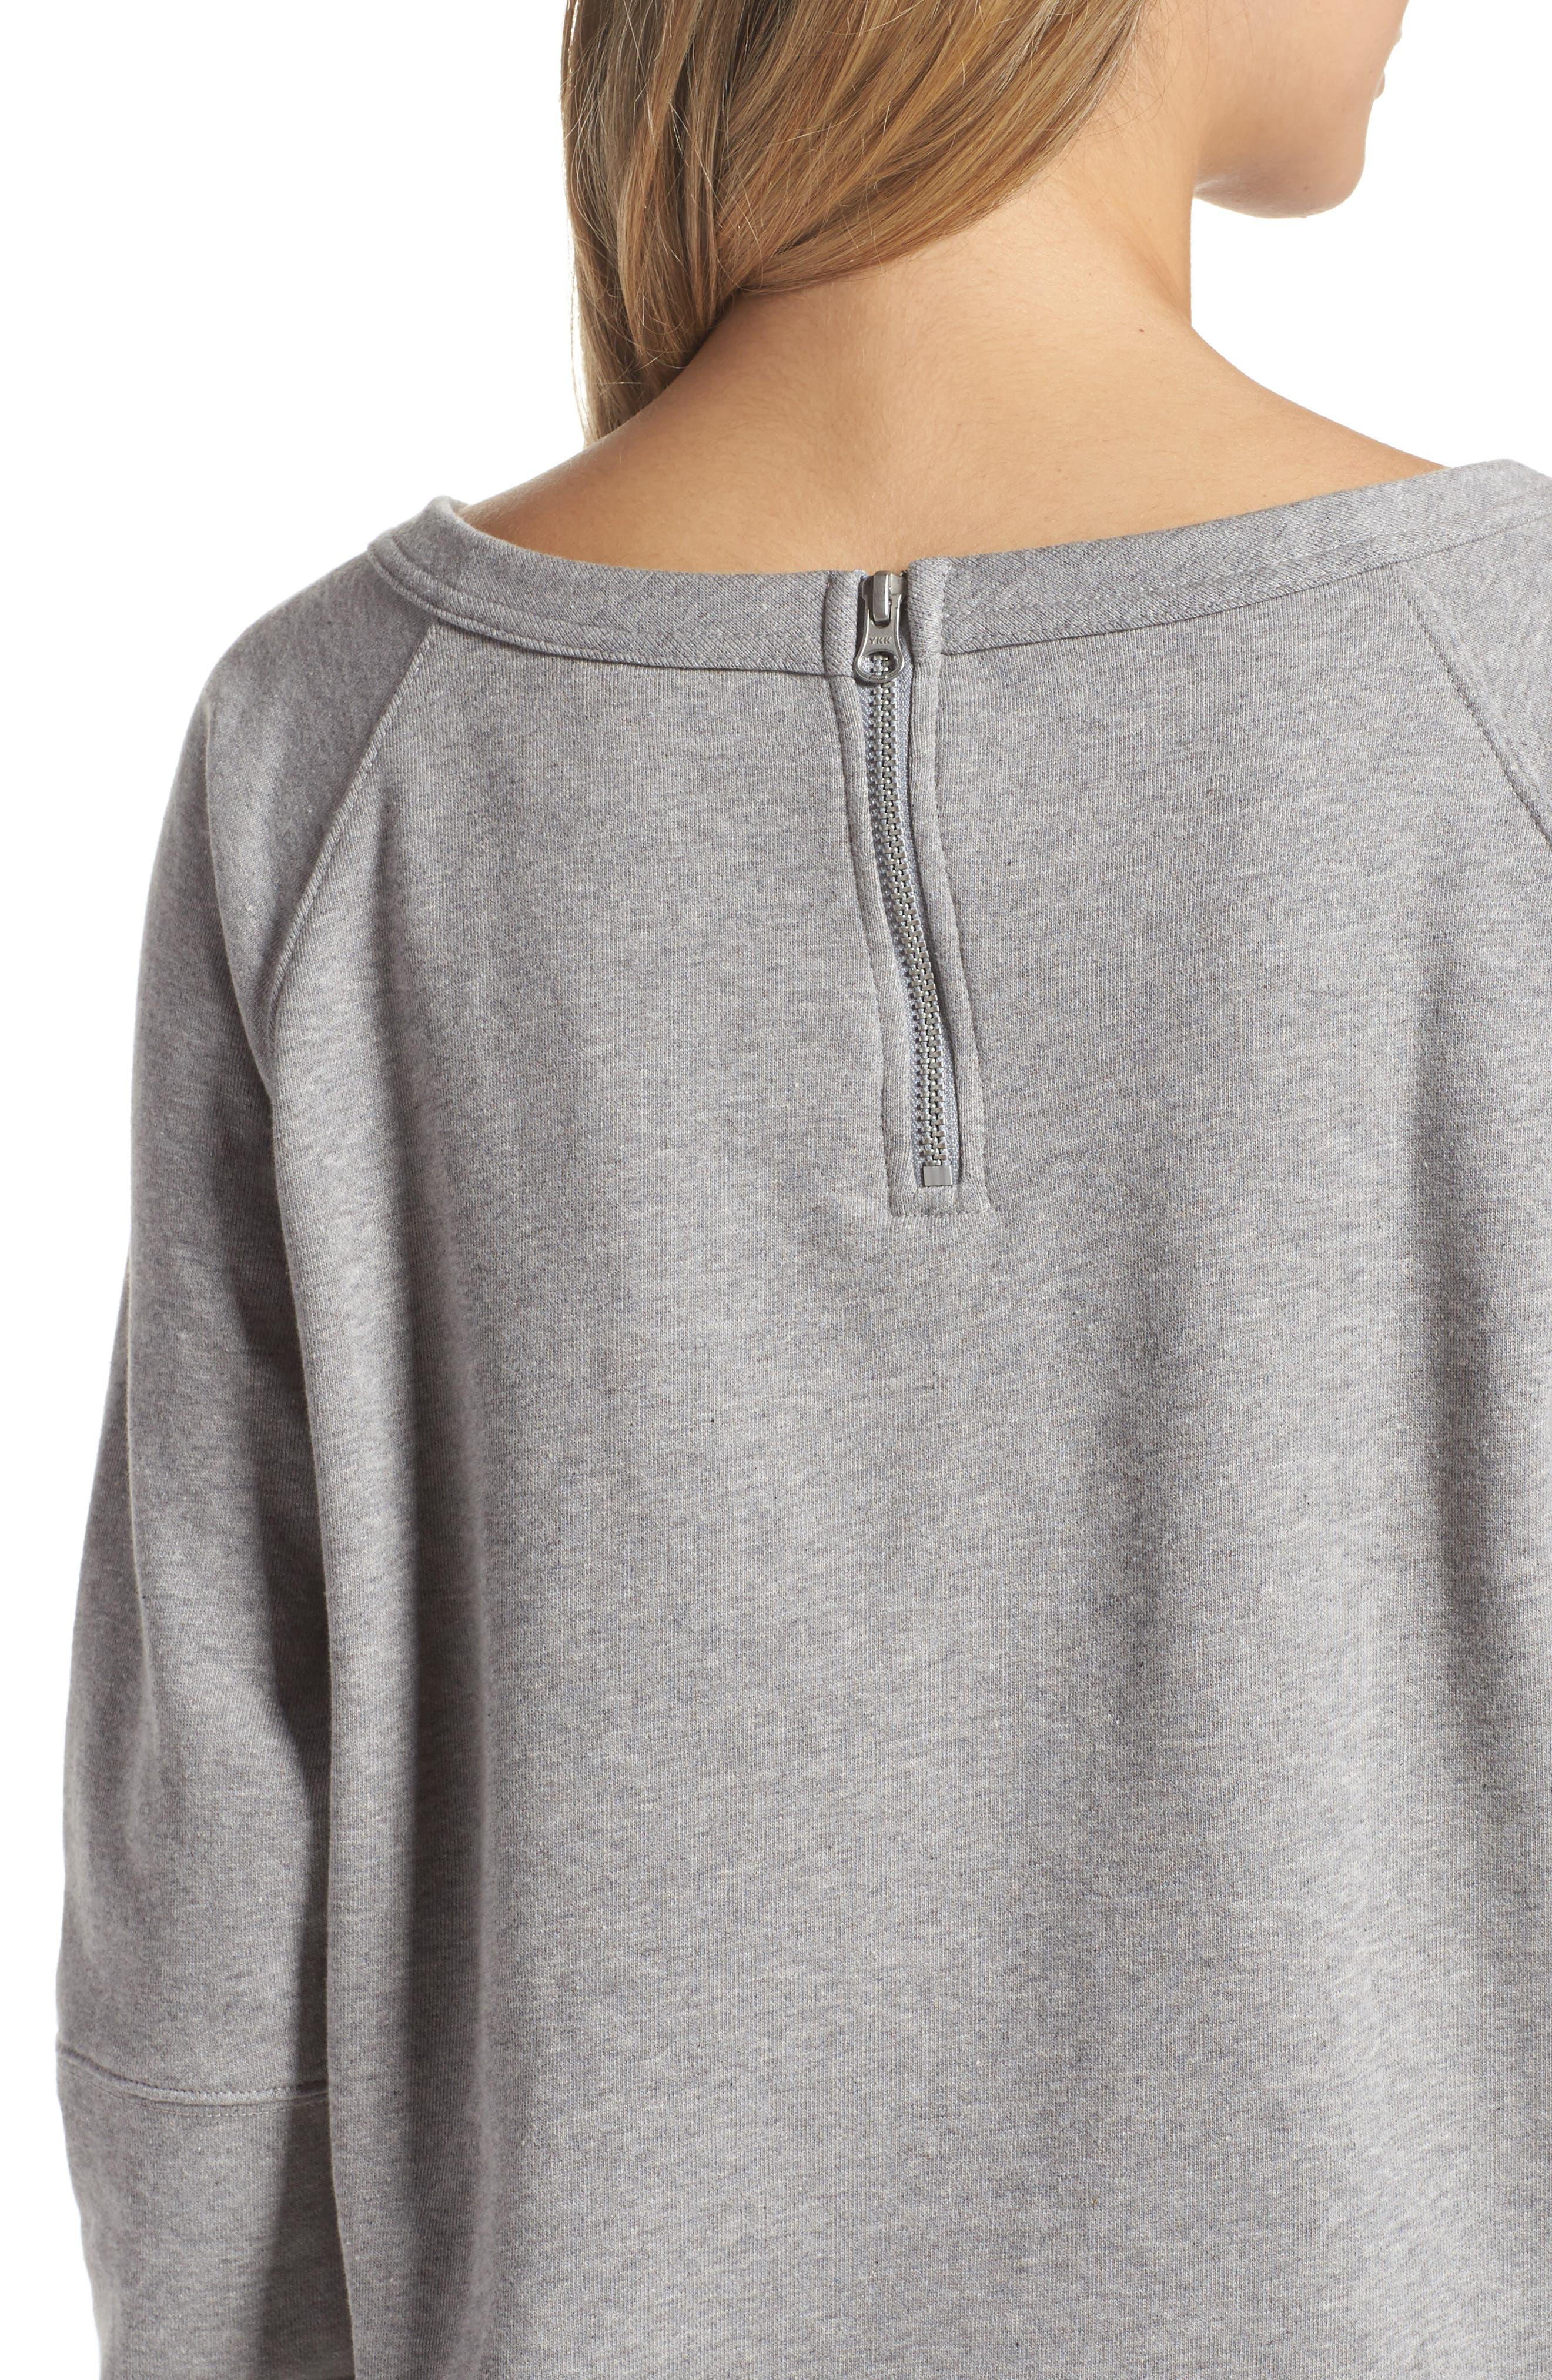 Heritage Starcrest Sweatshirt,                             Alternate thumbnail 4, color,                             Medium Heather Grey